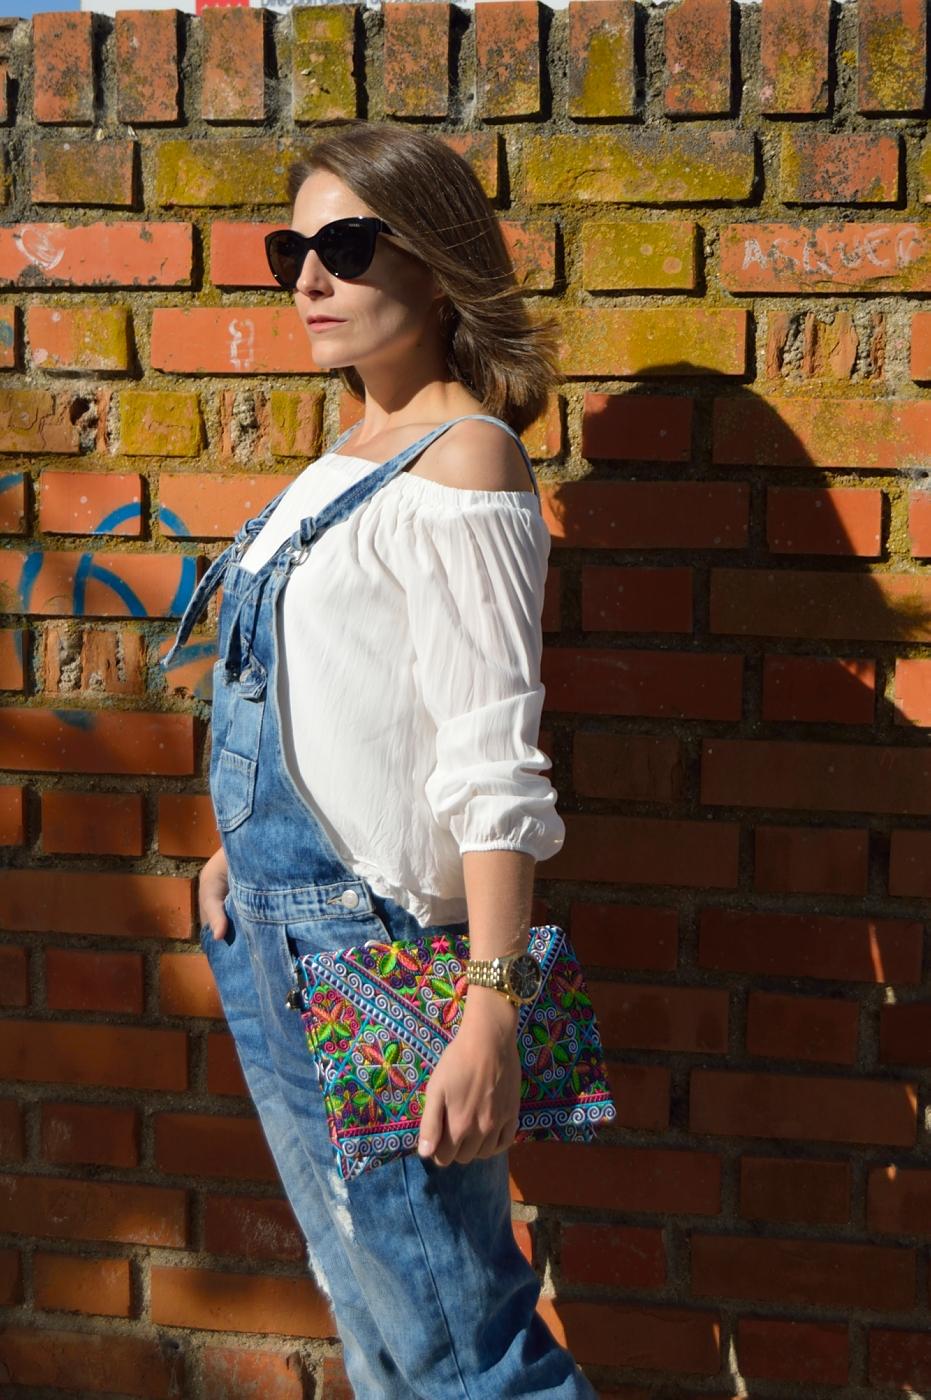 lara-vazquez-mad-lula-style-look-denim-jumpsuit-moda-glamour-spring-inspo